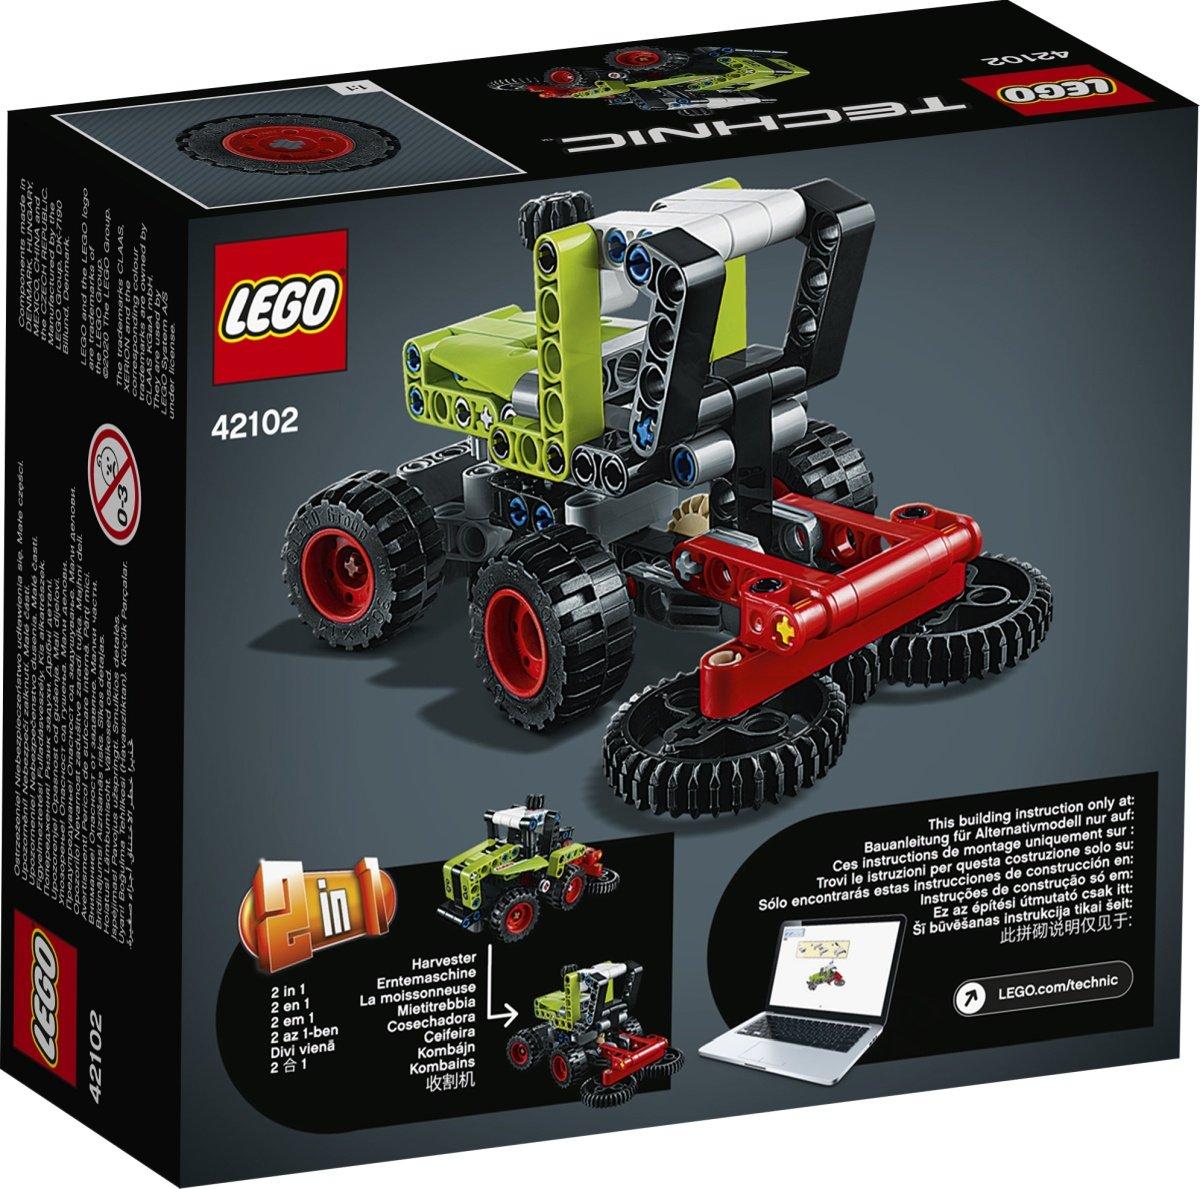 LEGO Technic 2020 Official Set Images - The Brick Fan